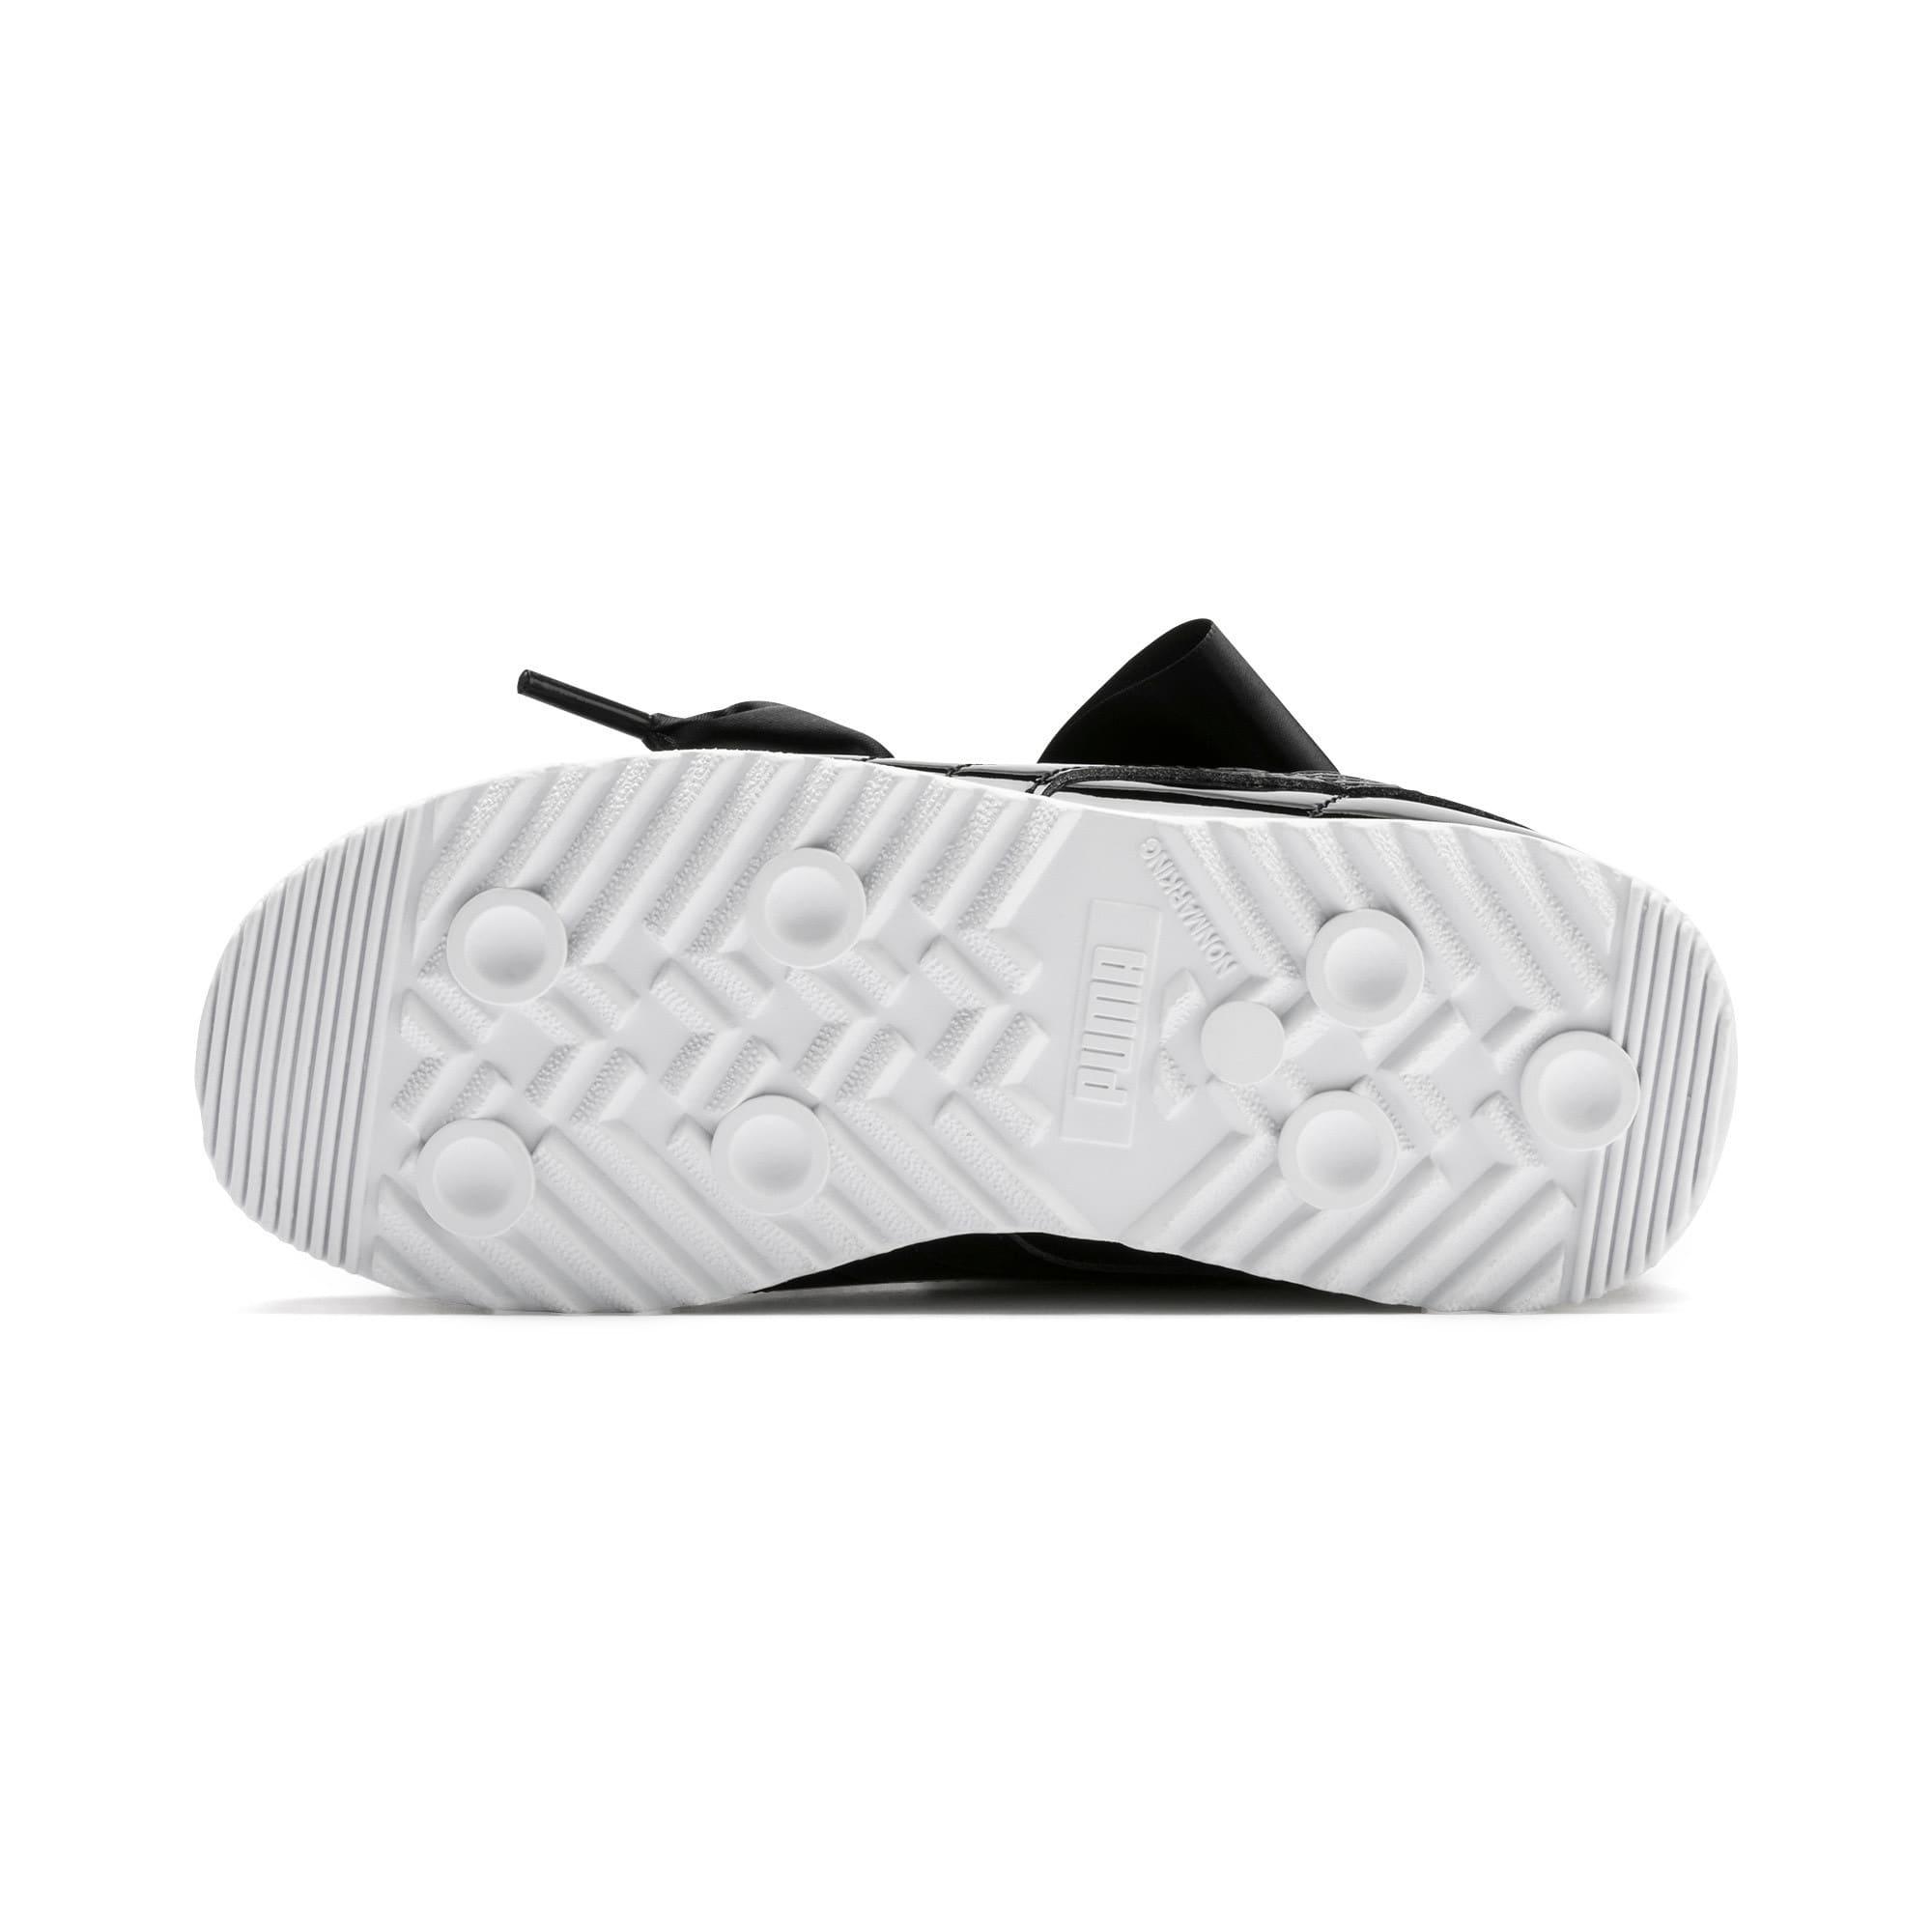 Thumbnail 4 of Roma Heart Patent Kids Sneaker, Puma Black, medium